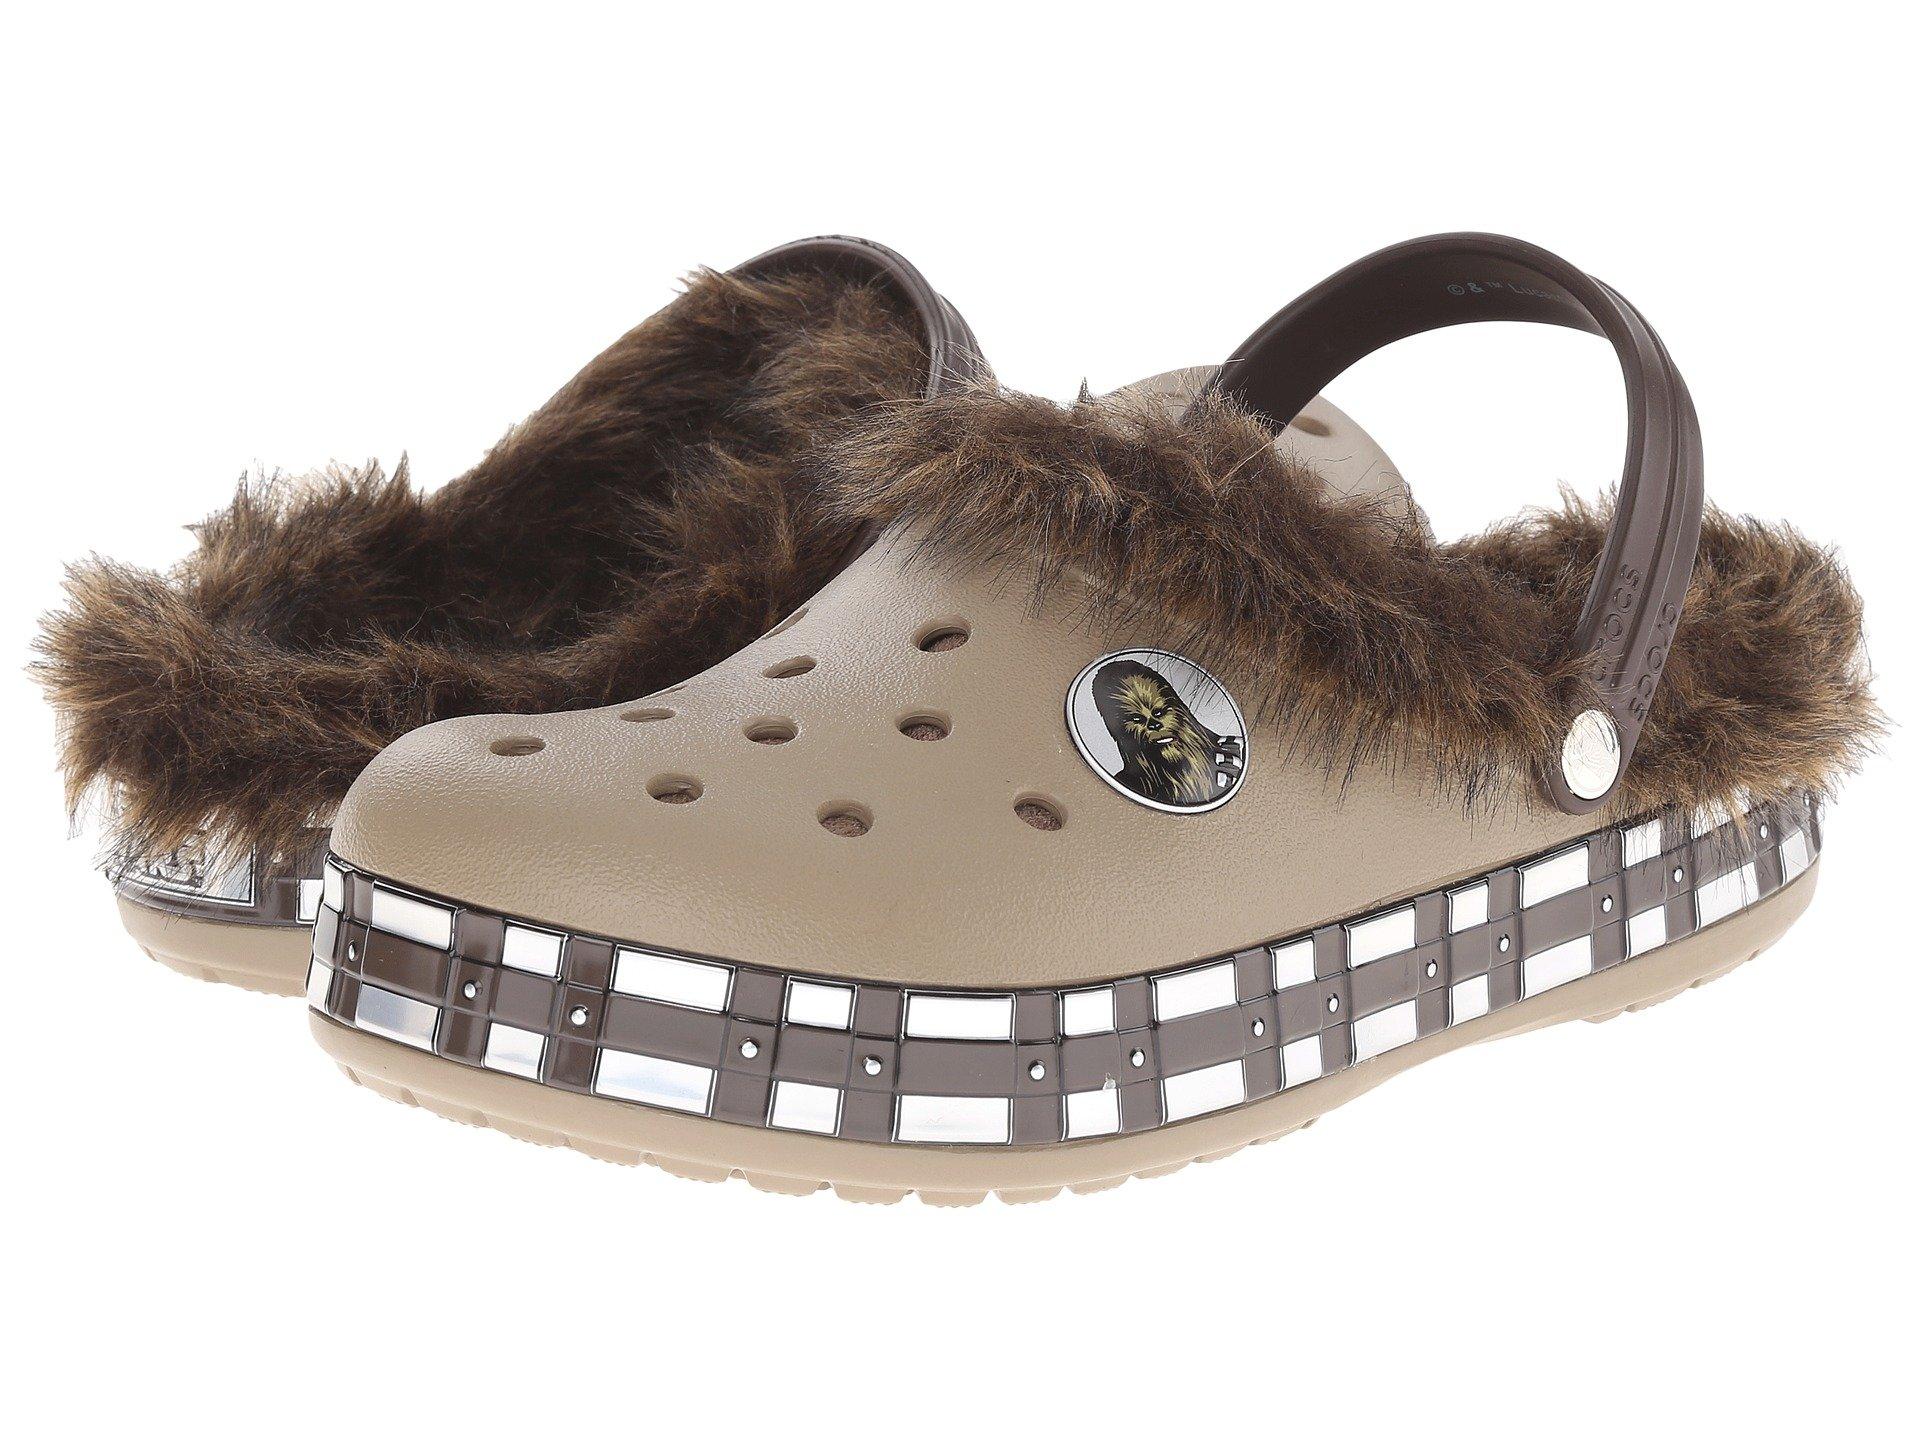 Calzado Sin Talon para Hombre Crocs CB Star Wars Chewbacca Lined Clog  + Crocs en VeoyCompro.net